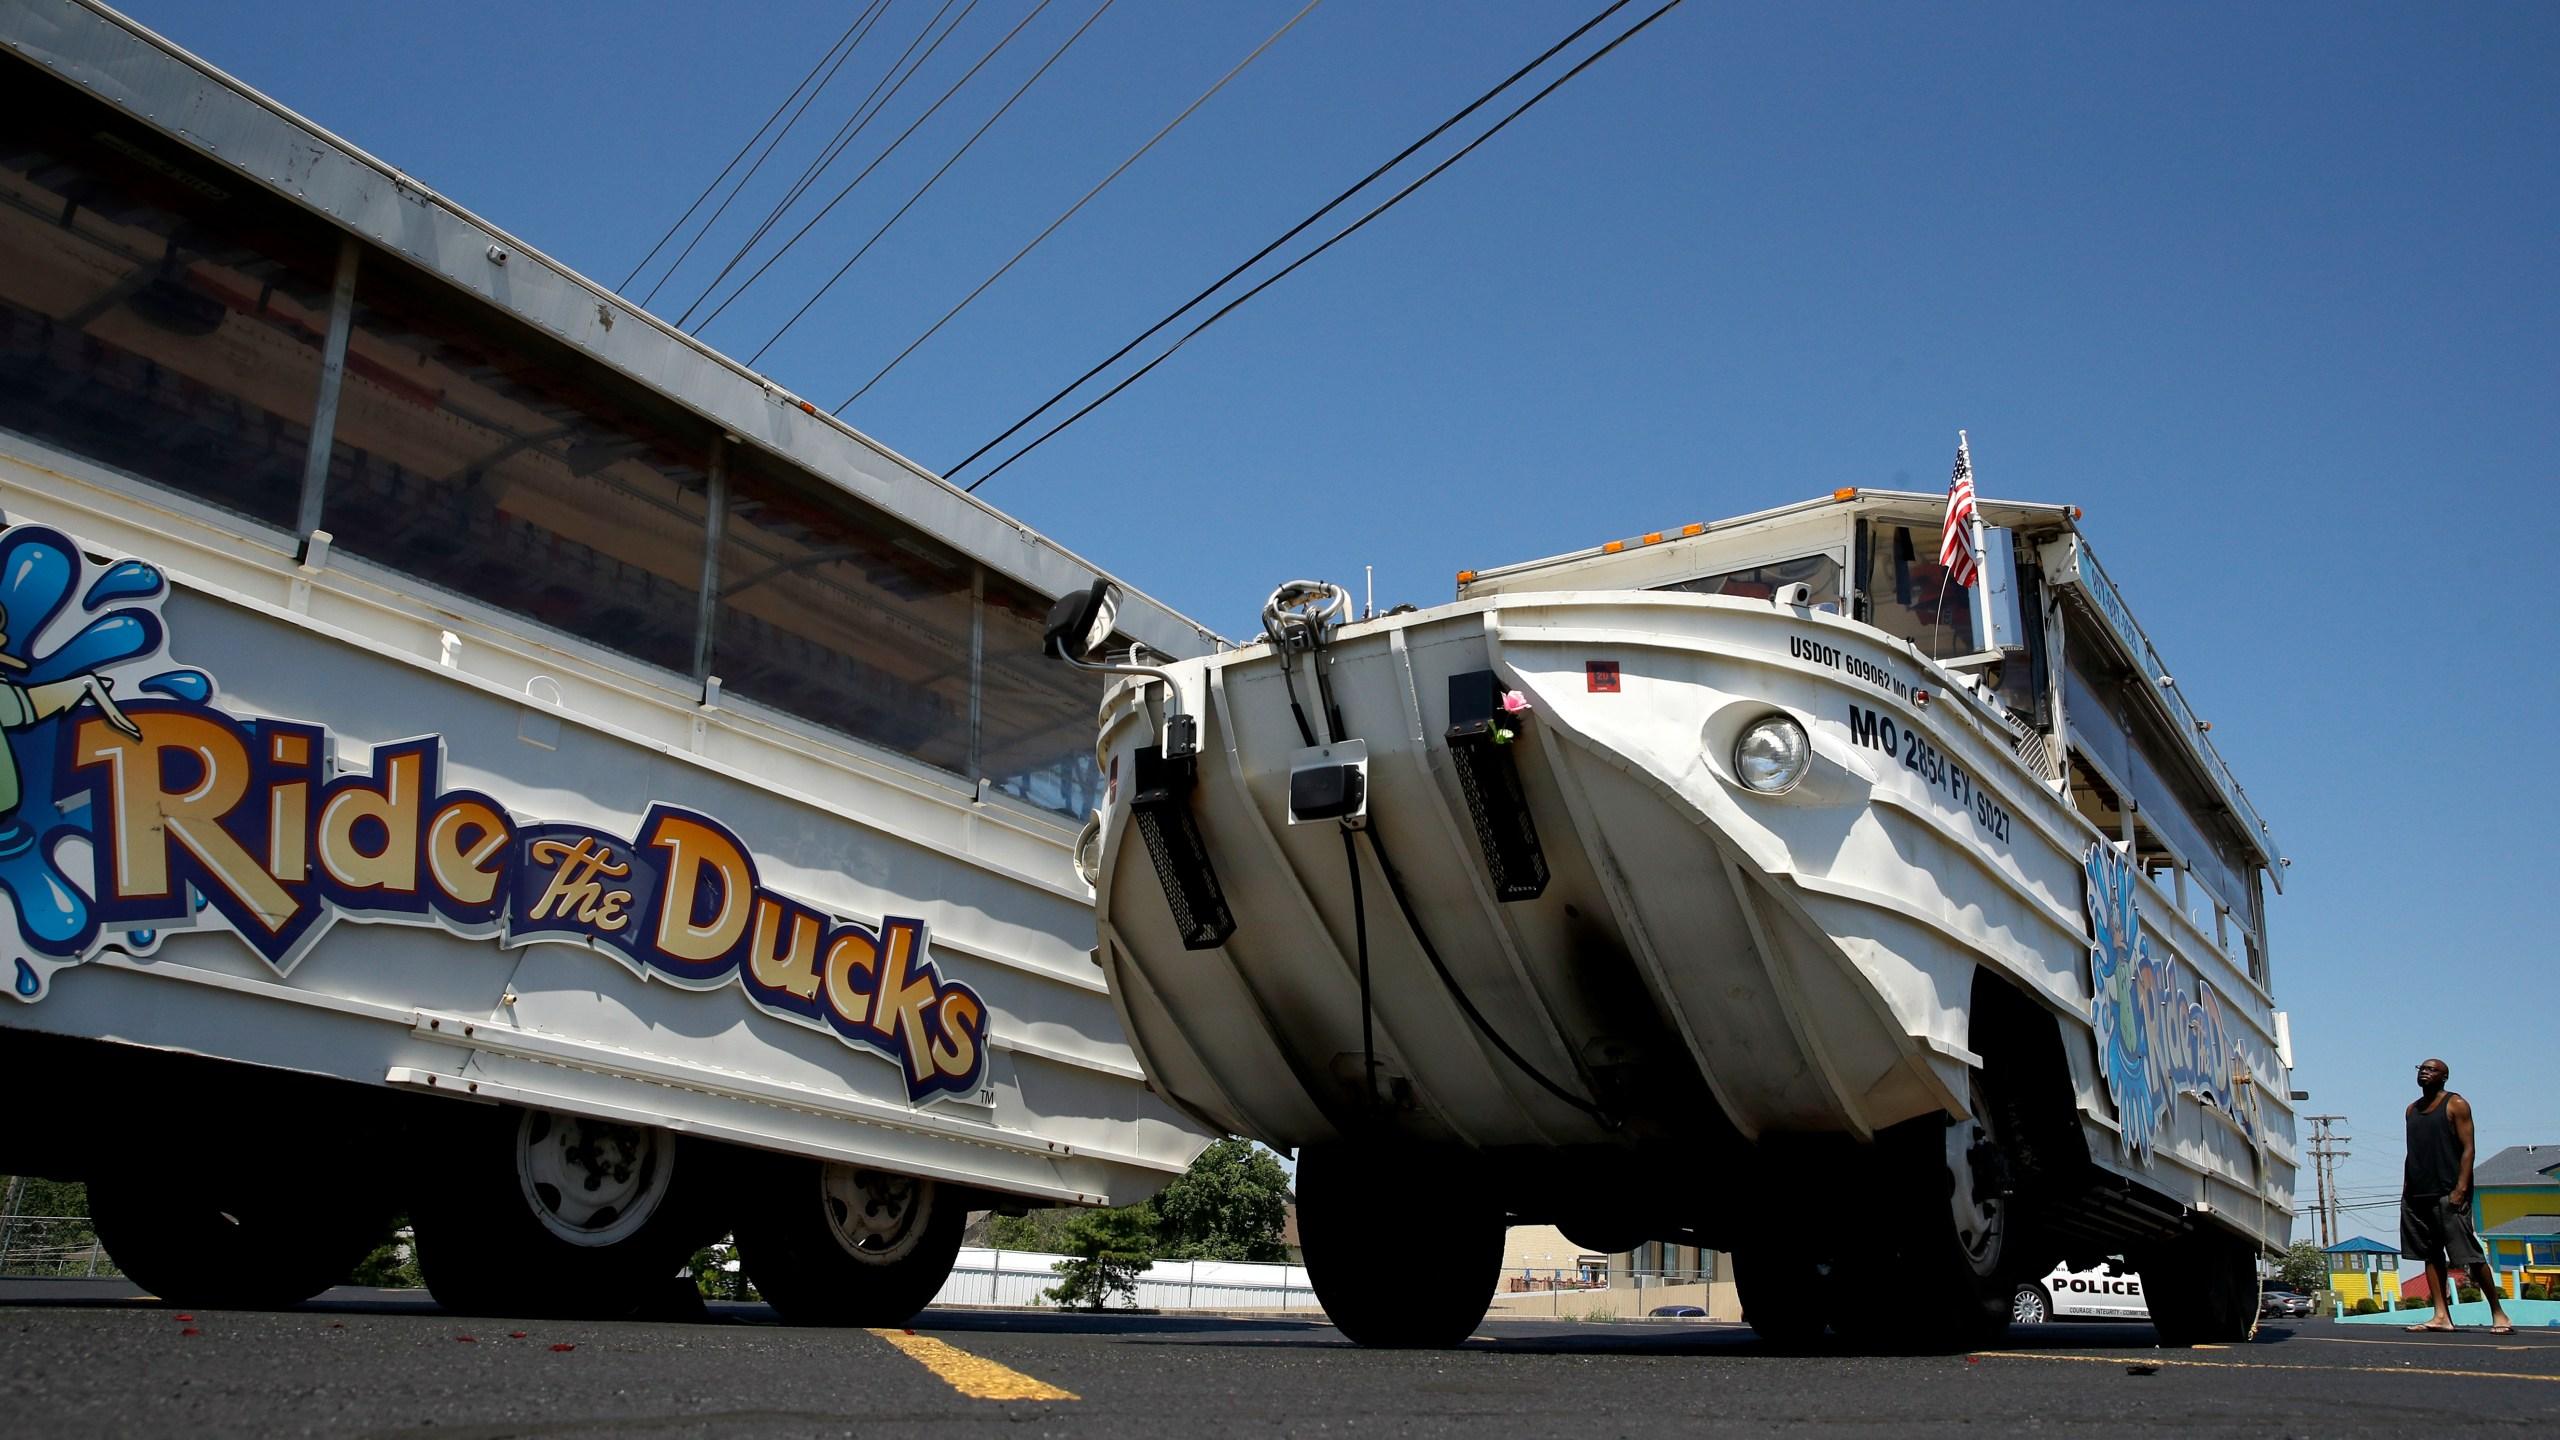 Missouri_Boat_Accident_39673-159532.jpg56425645